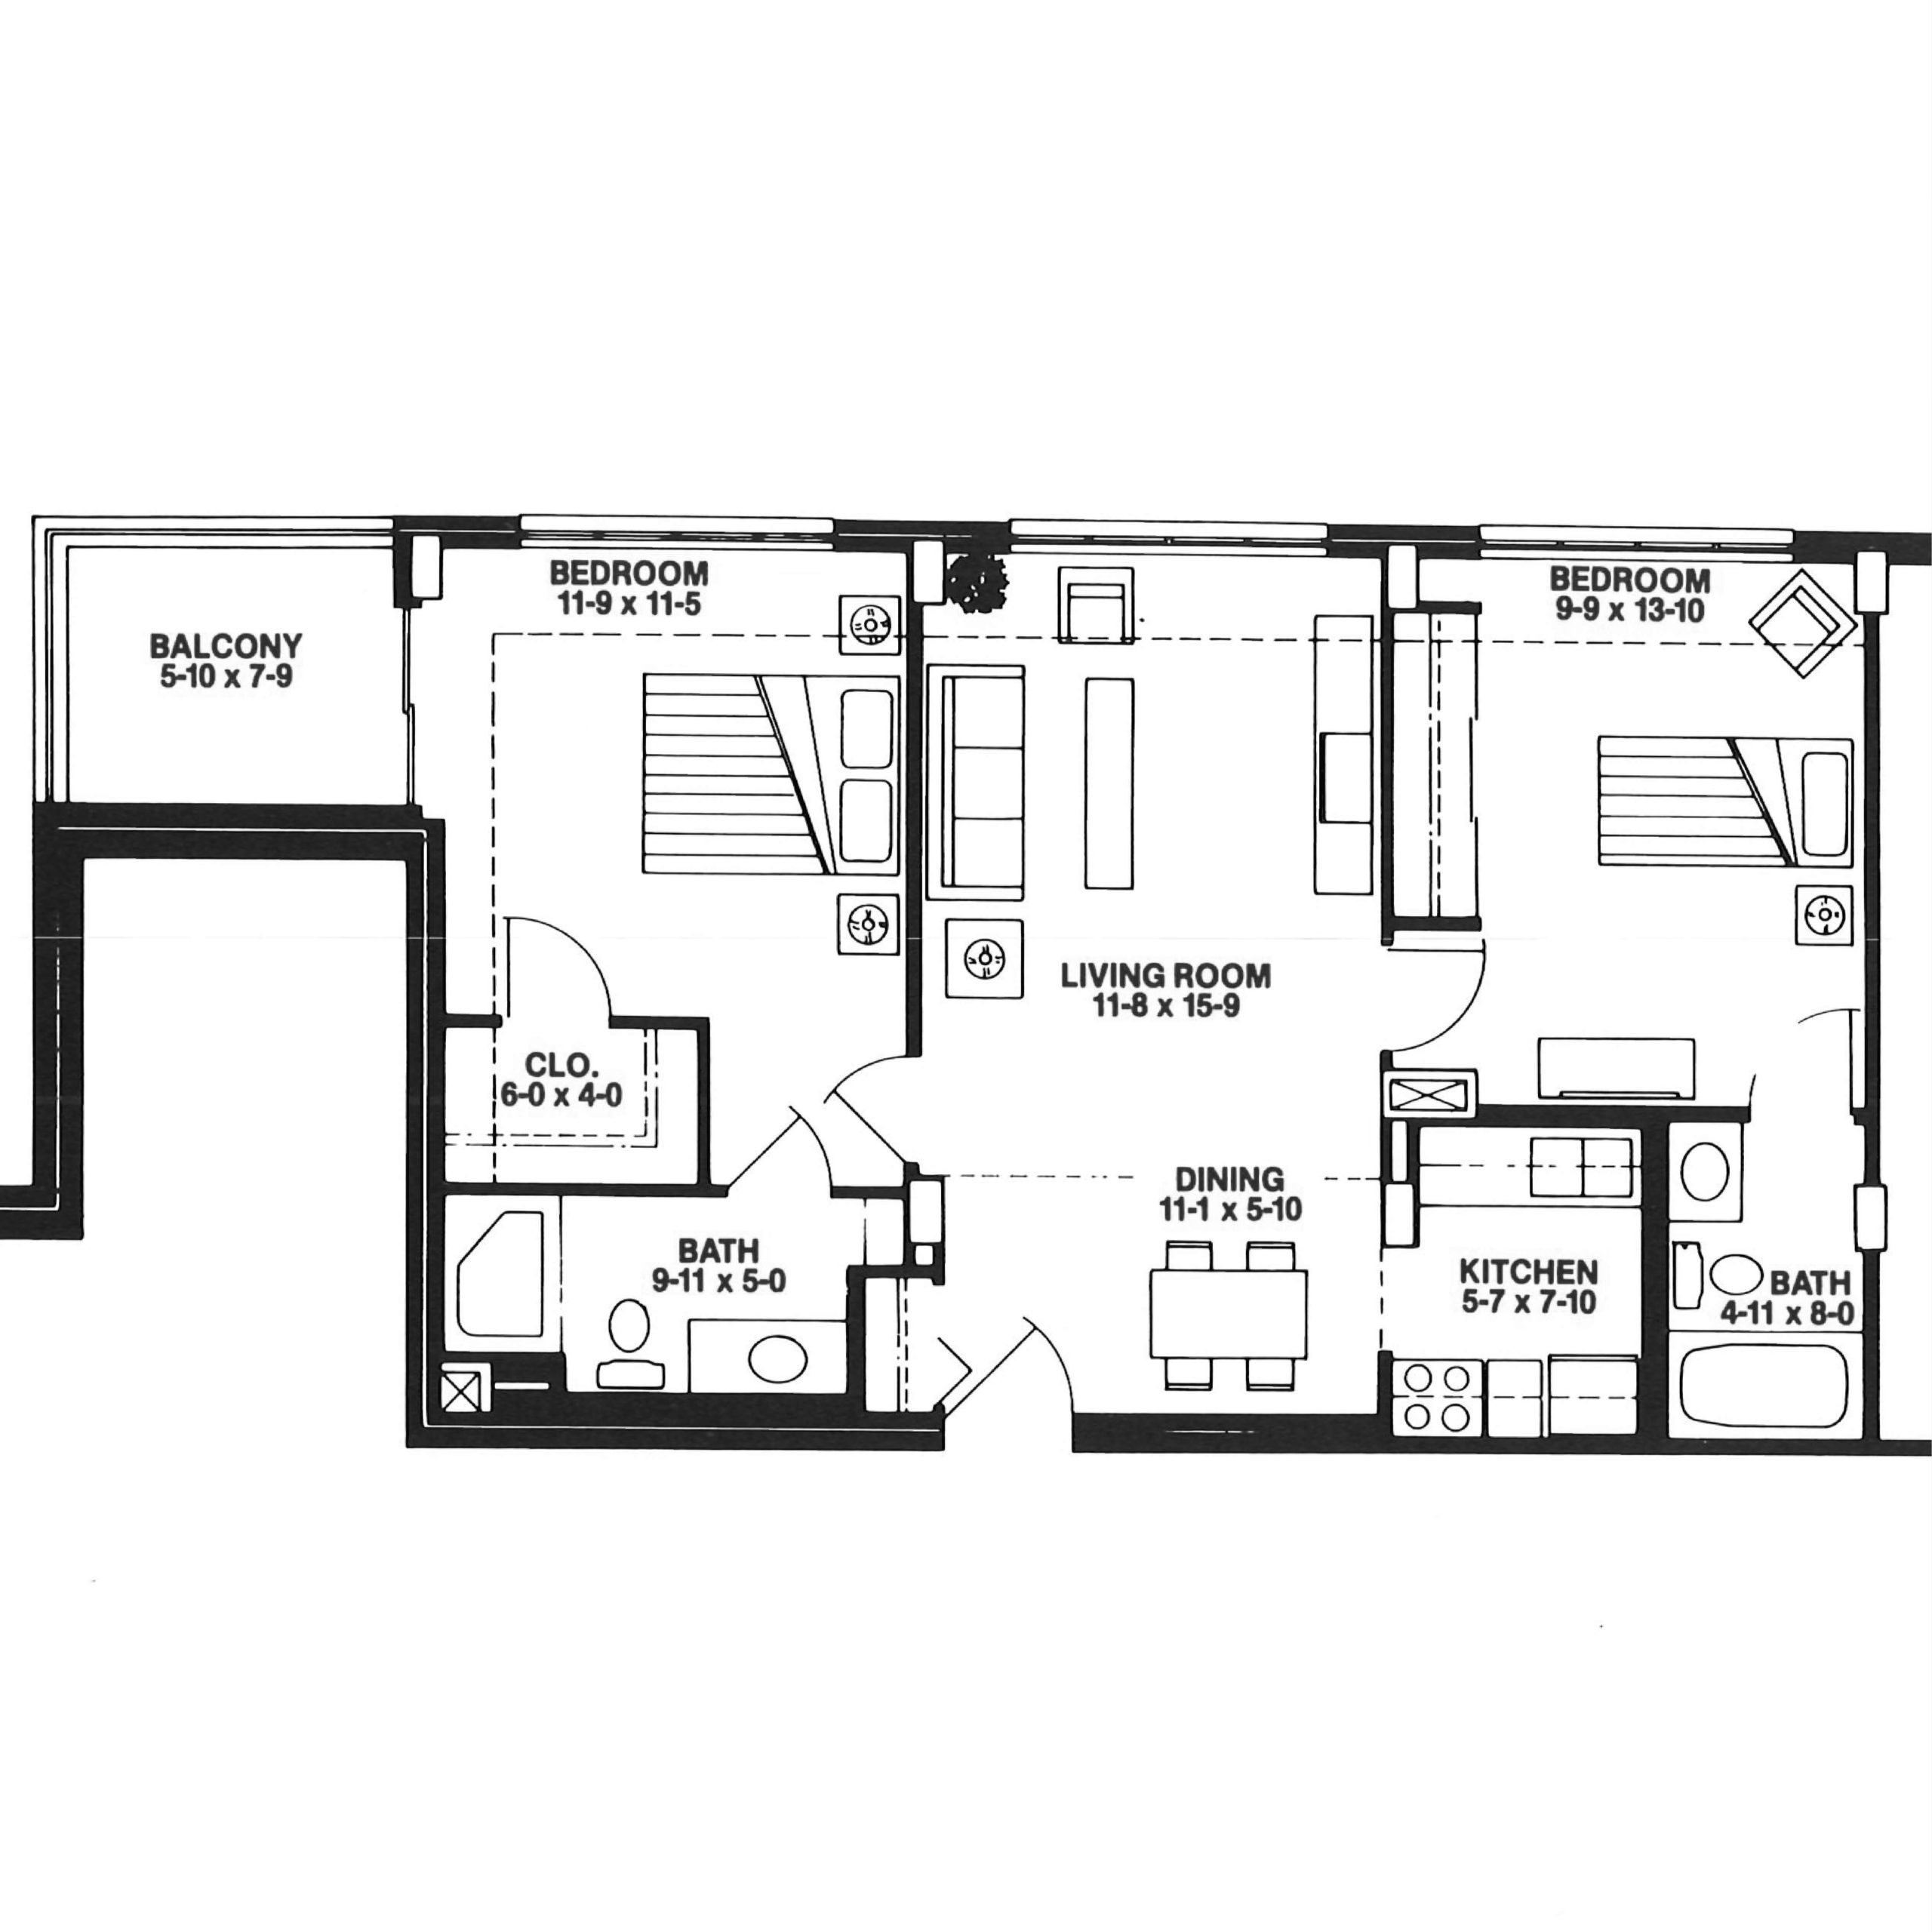 The Skyline floor plan blueprint